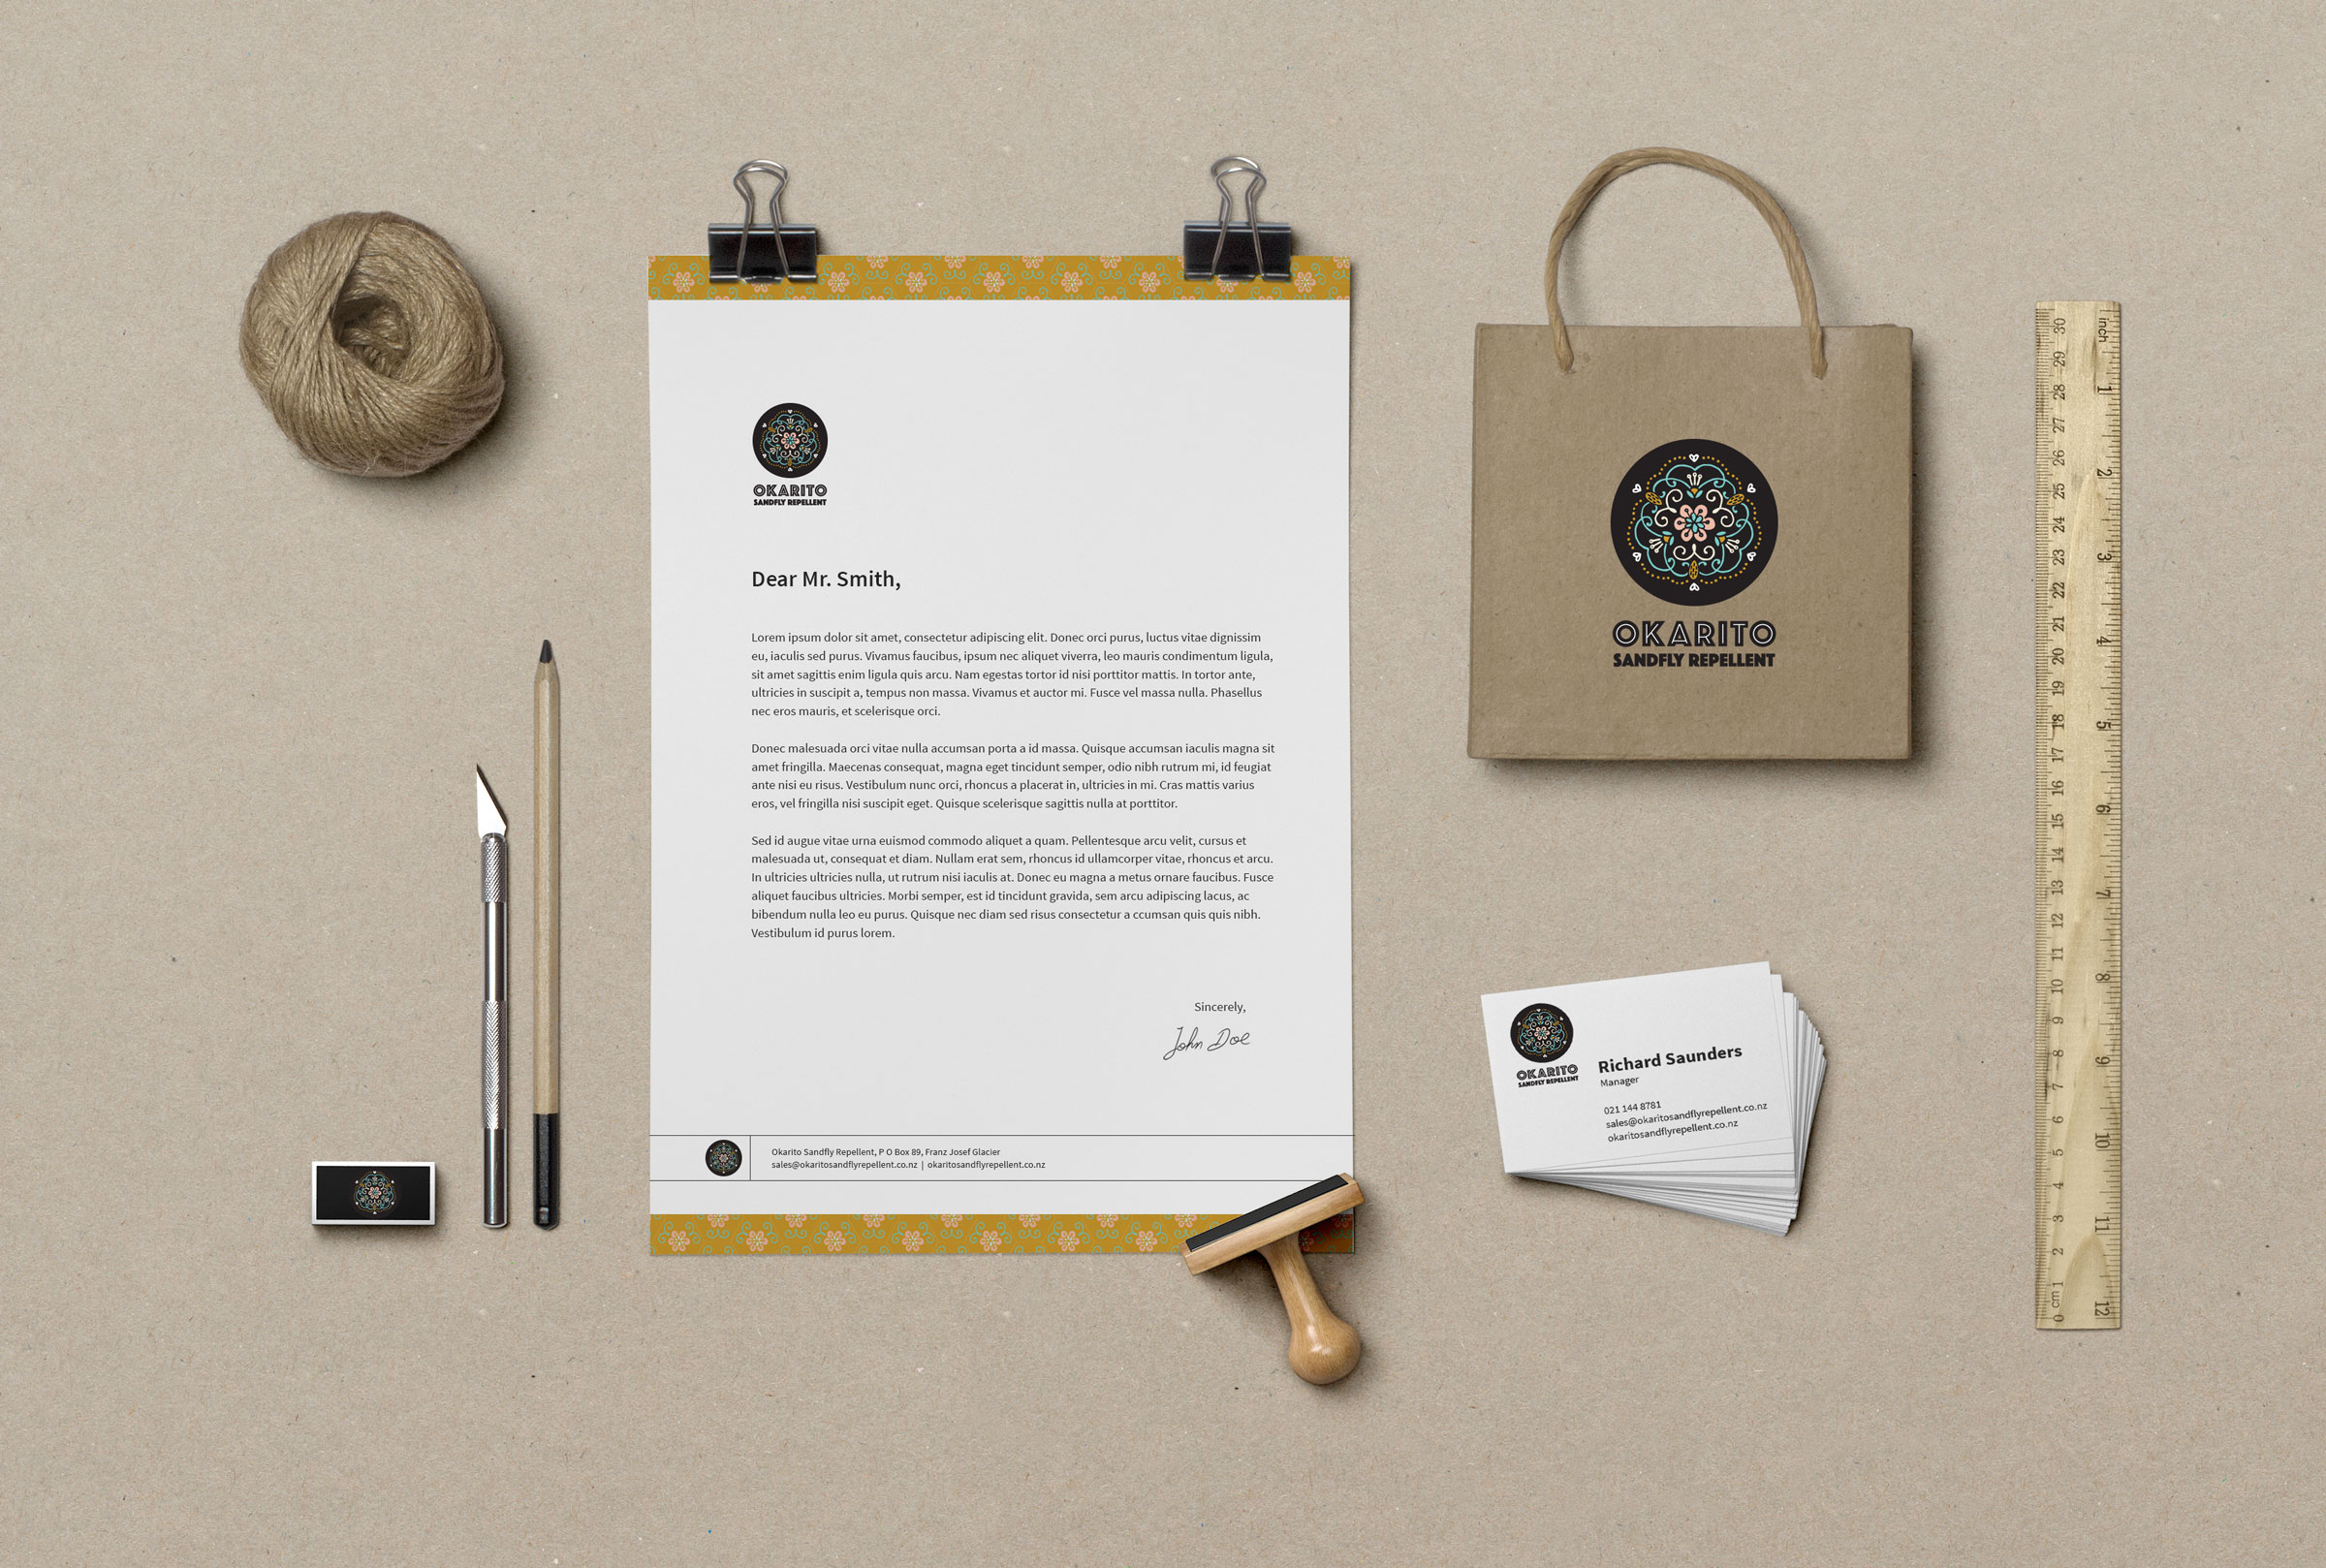 Okarito Sandfly Repellent | Branding